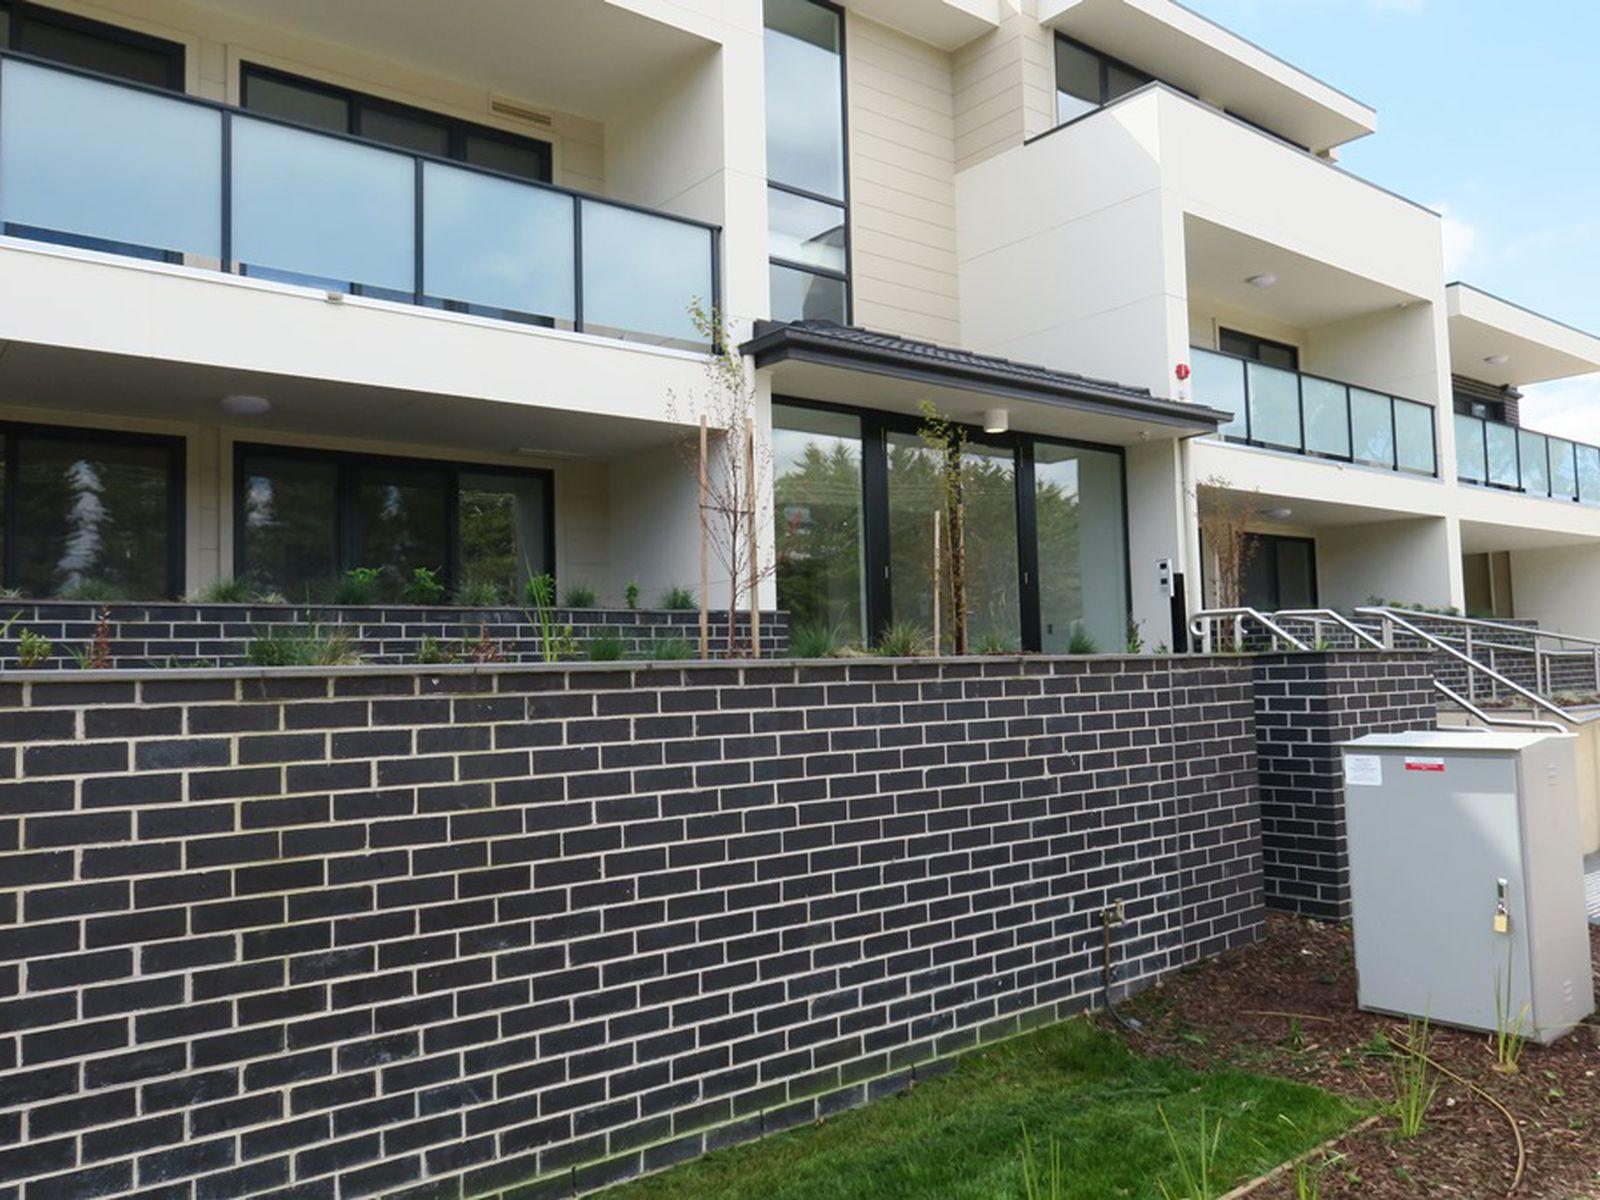 106 / 519-521 High Street Road, Mount Waverley